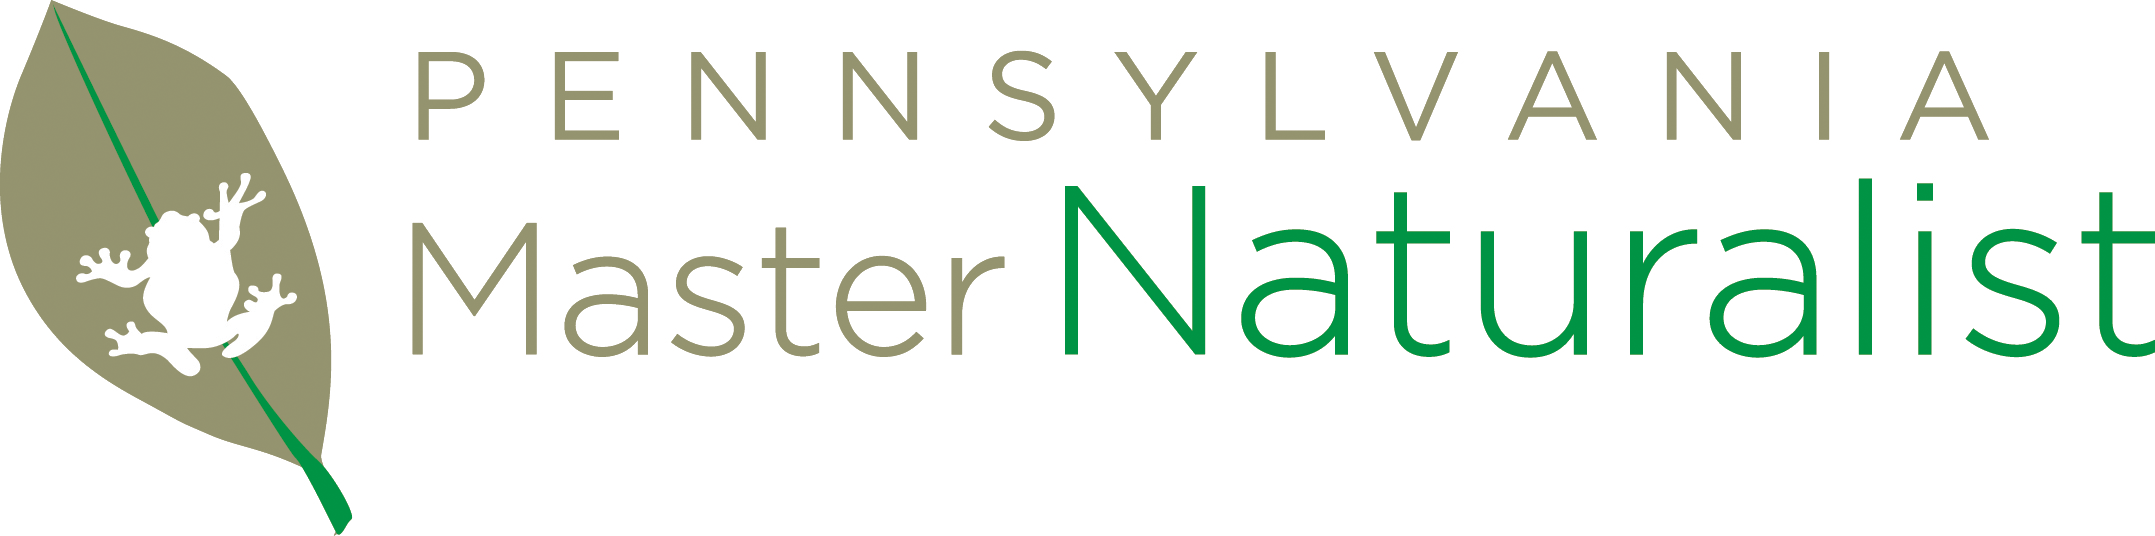 Pennsylvania Master Naturalist